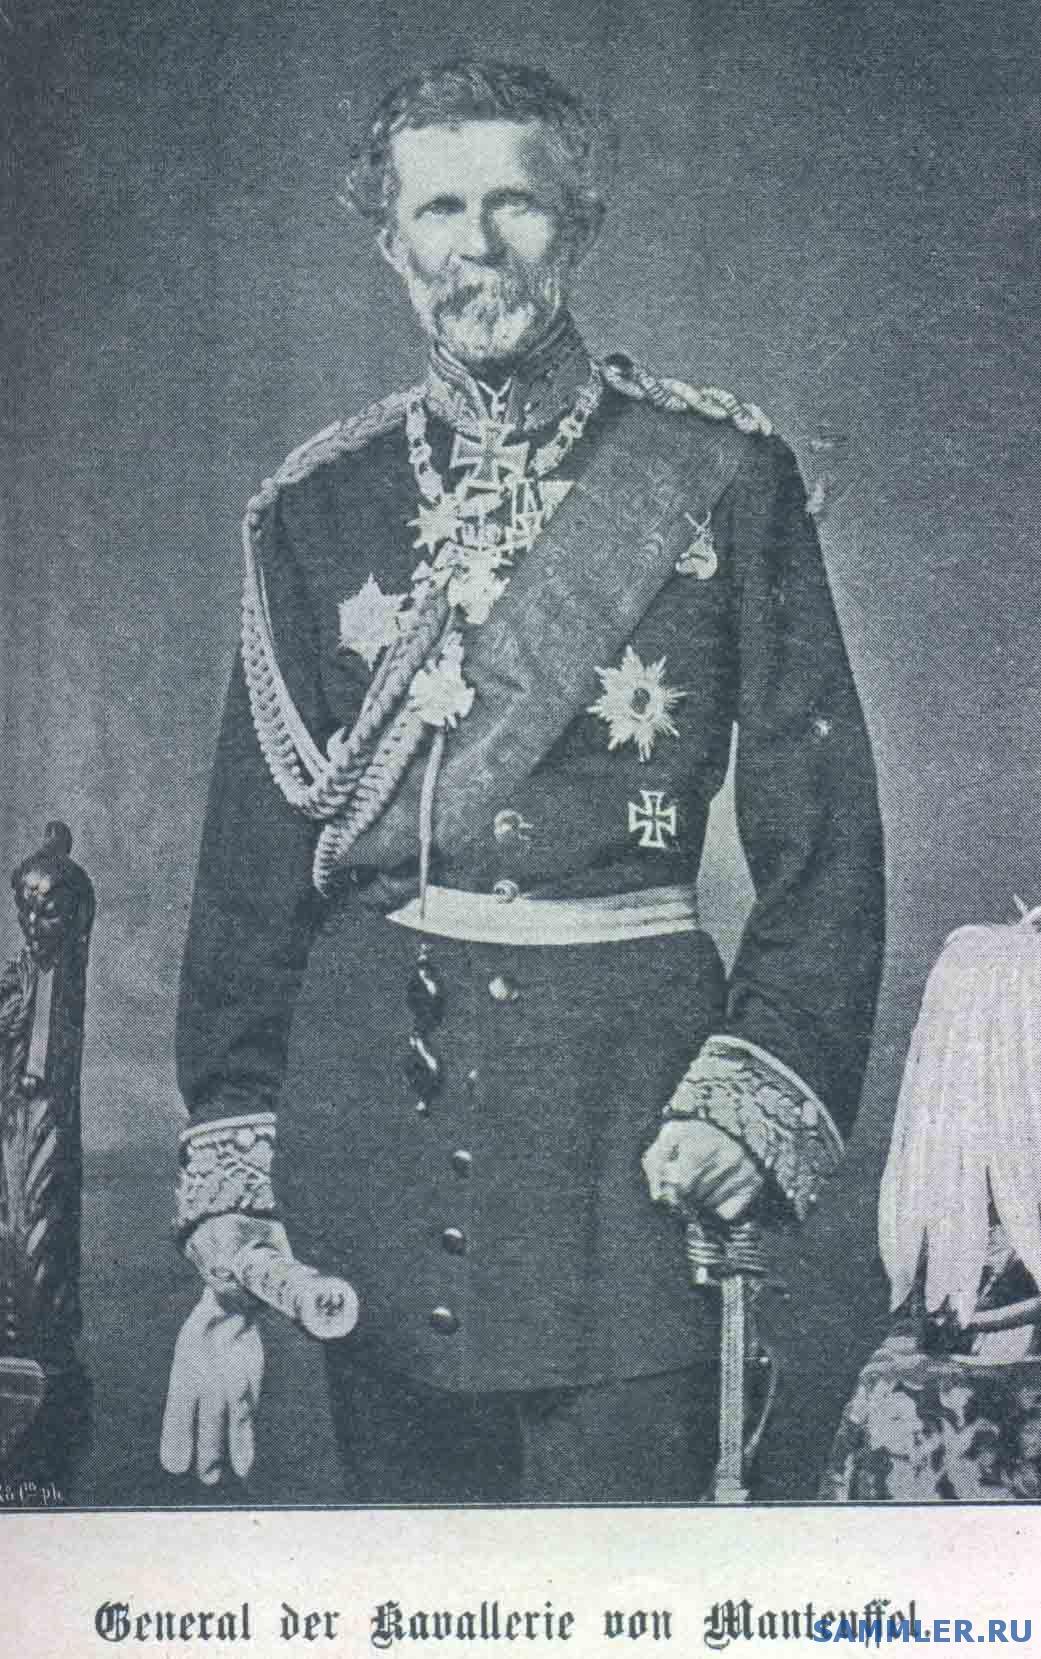 6._Generalfeldmarschall_Edwin_Karl_Rochus_von_Manteuffel.jpg